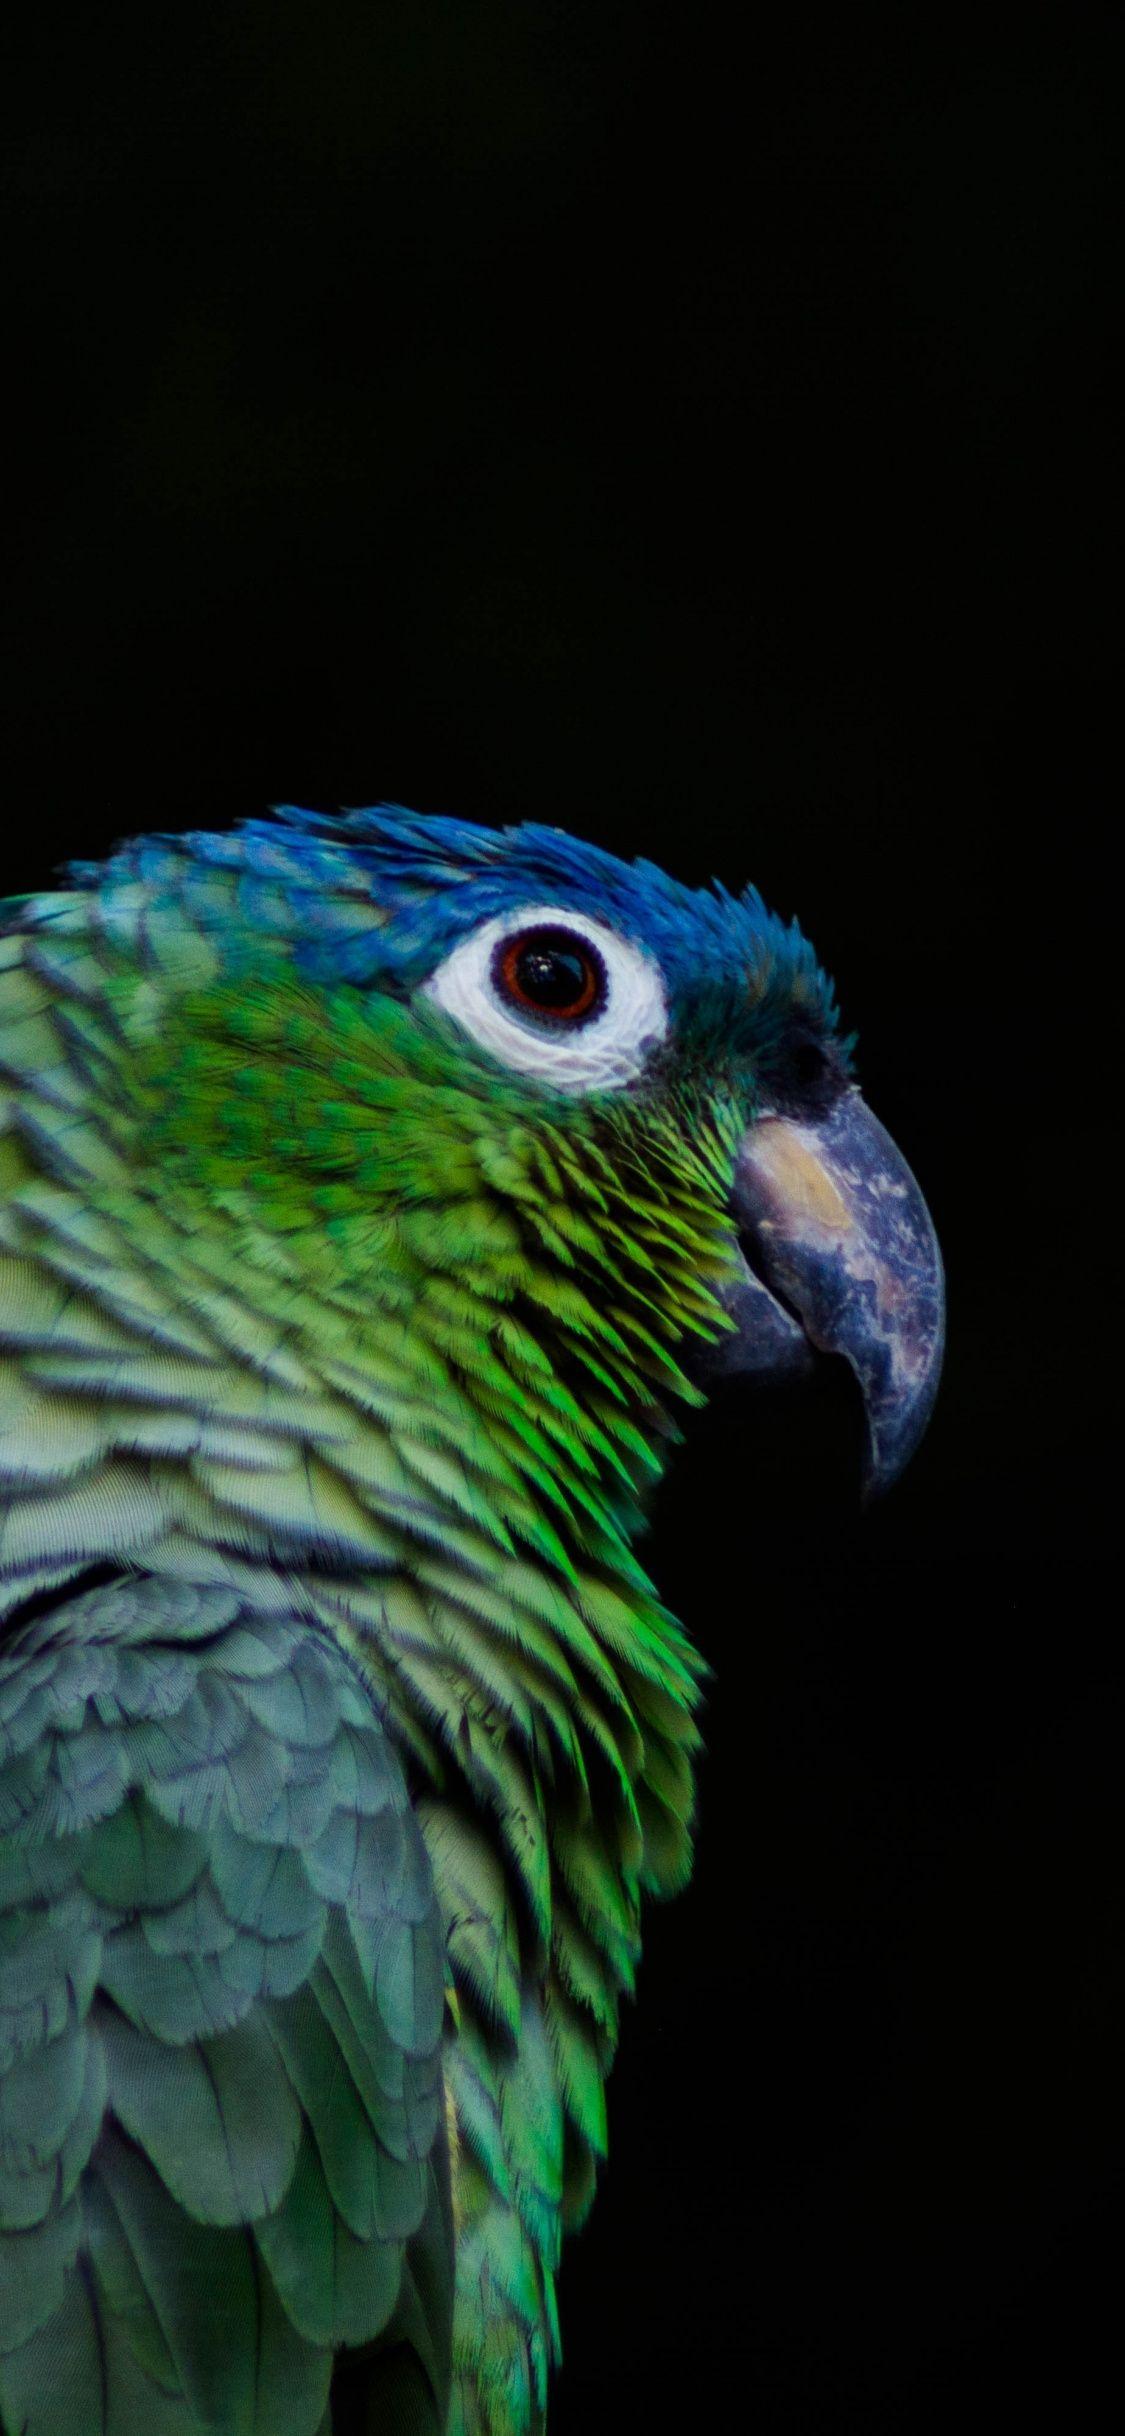 Greenish, colorful, parrot, bird, 1125x2436 wallpaper